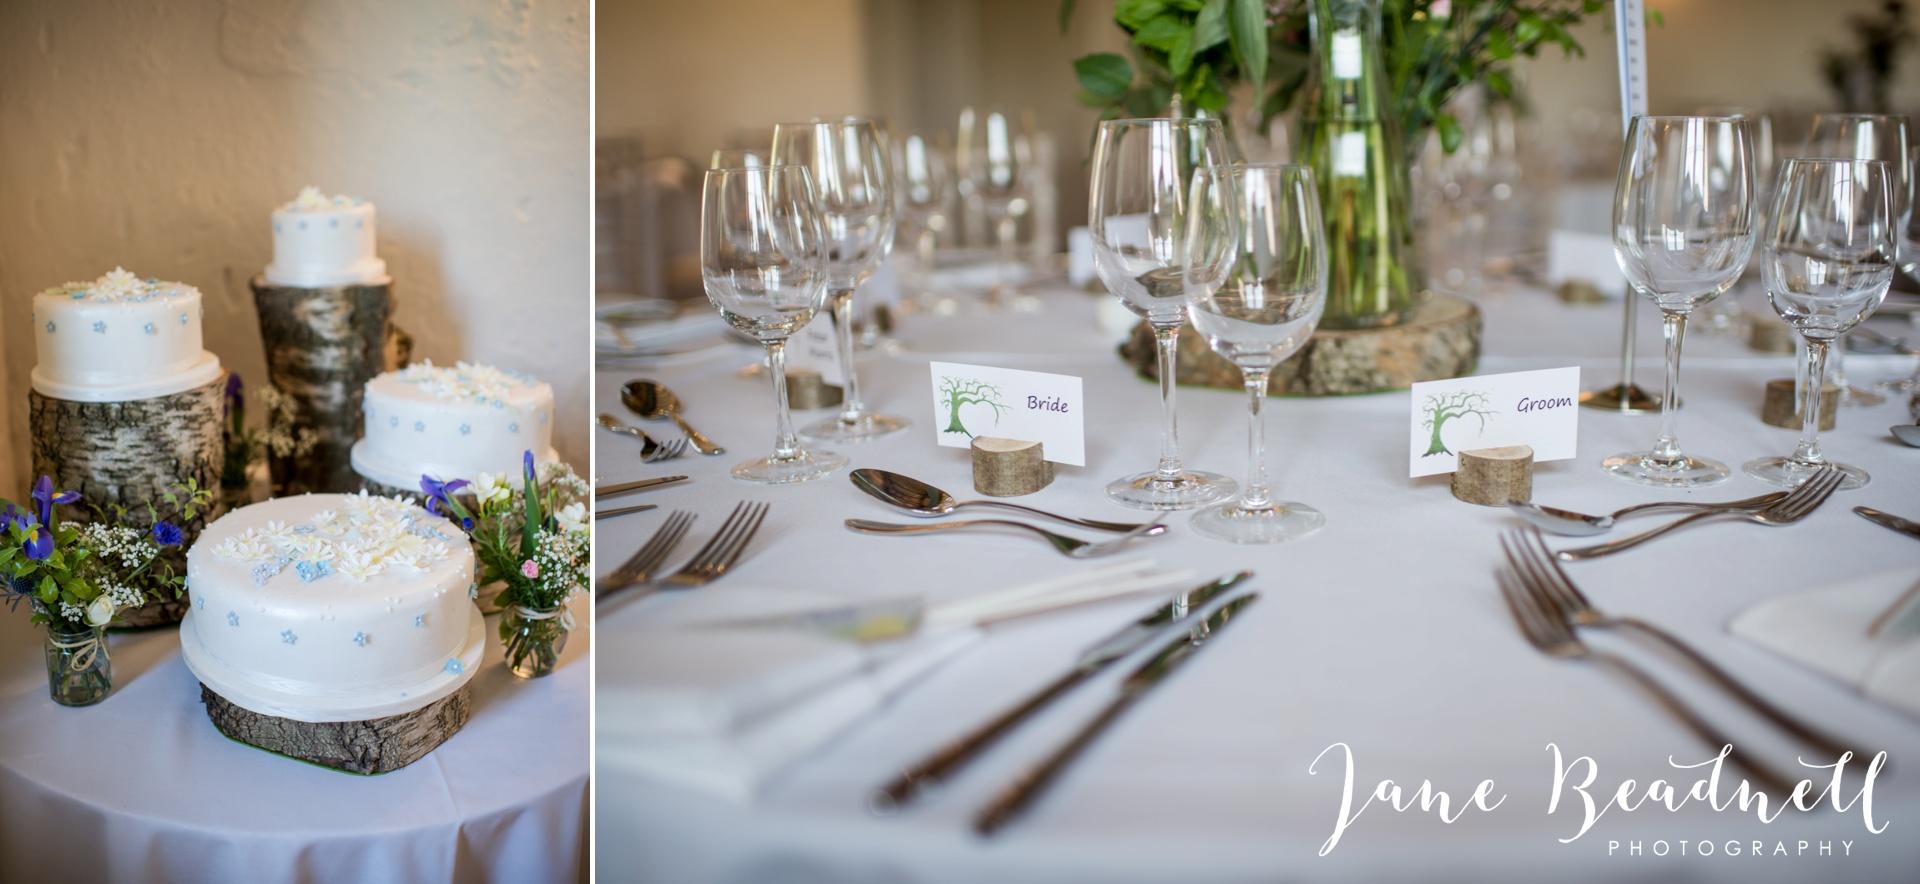 Bath Abbey wedding photography by fine art wedding photographer Leeds Jane Beadnell_29